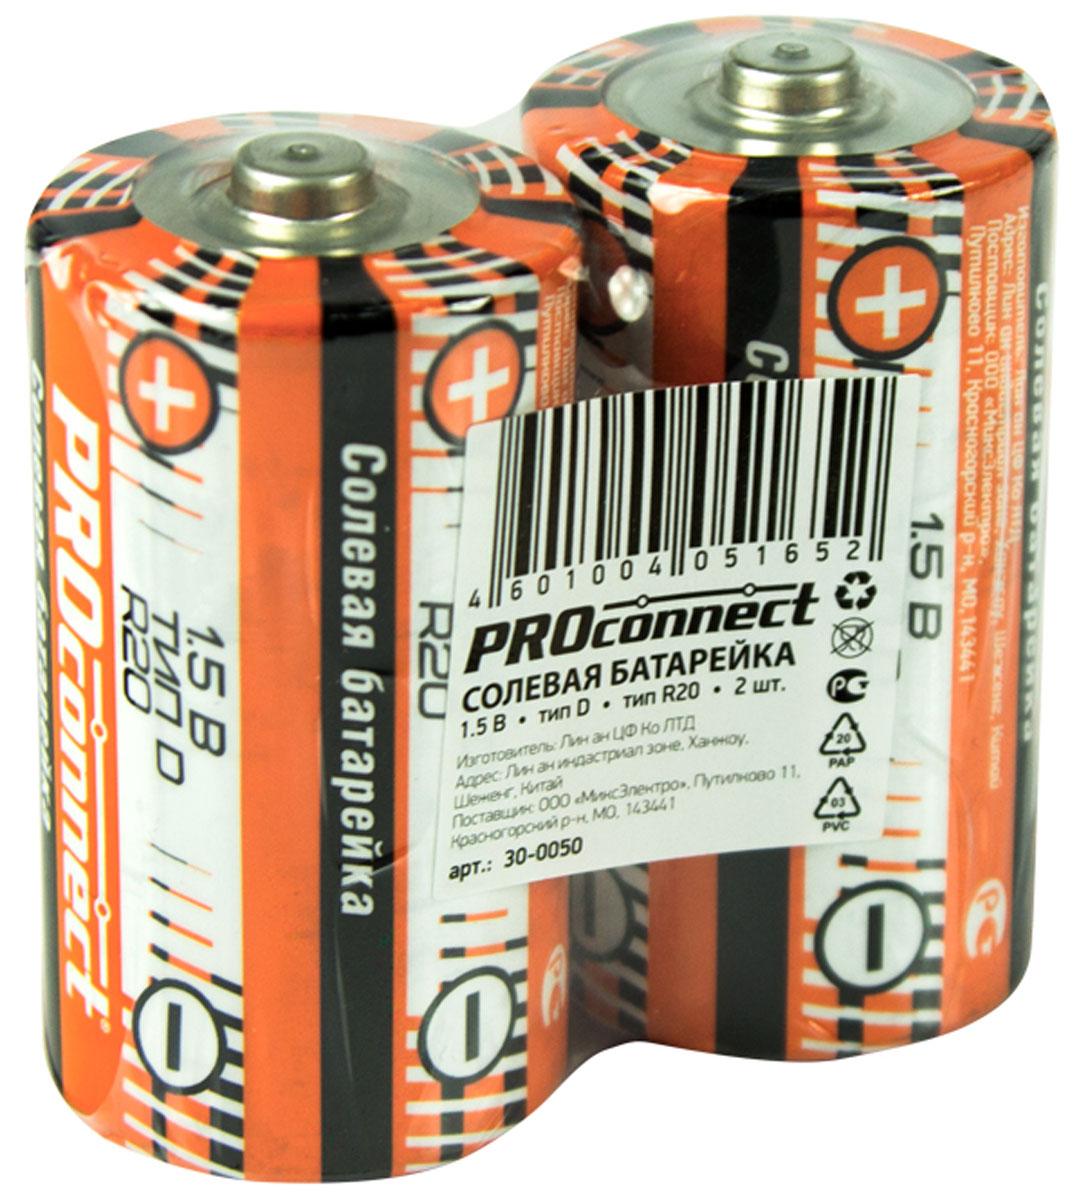 Батарейка солевая PROconnect, тип D-R20, 2 шт батарейка proconnect r20 30 0050 2 штуки